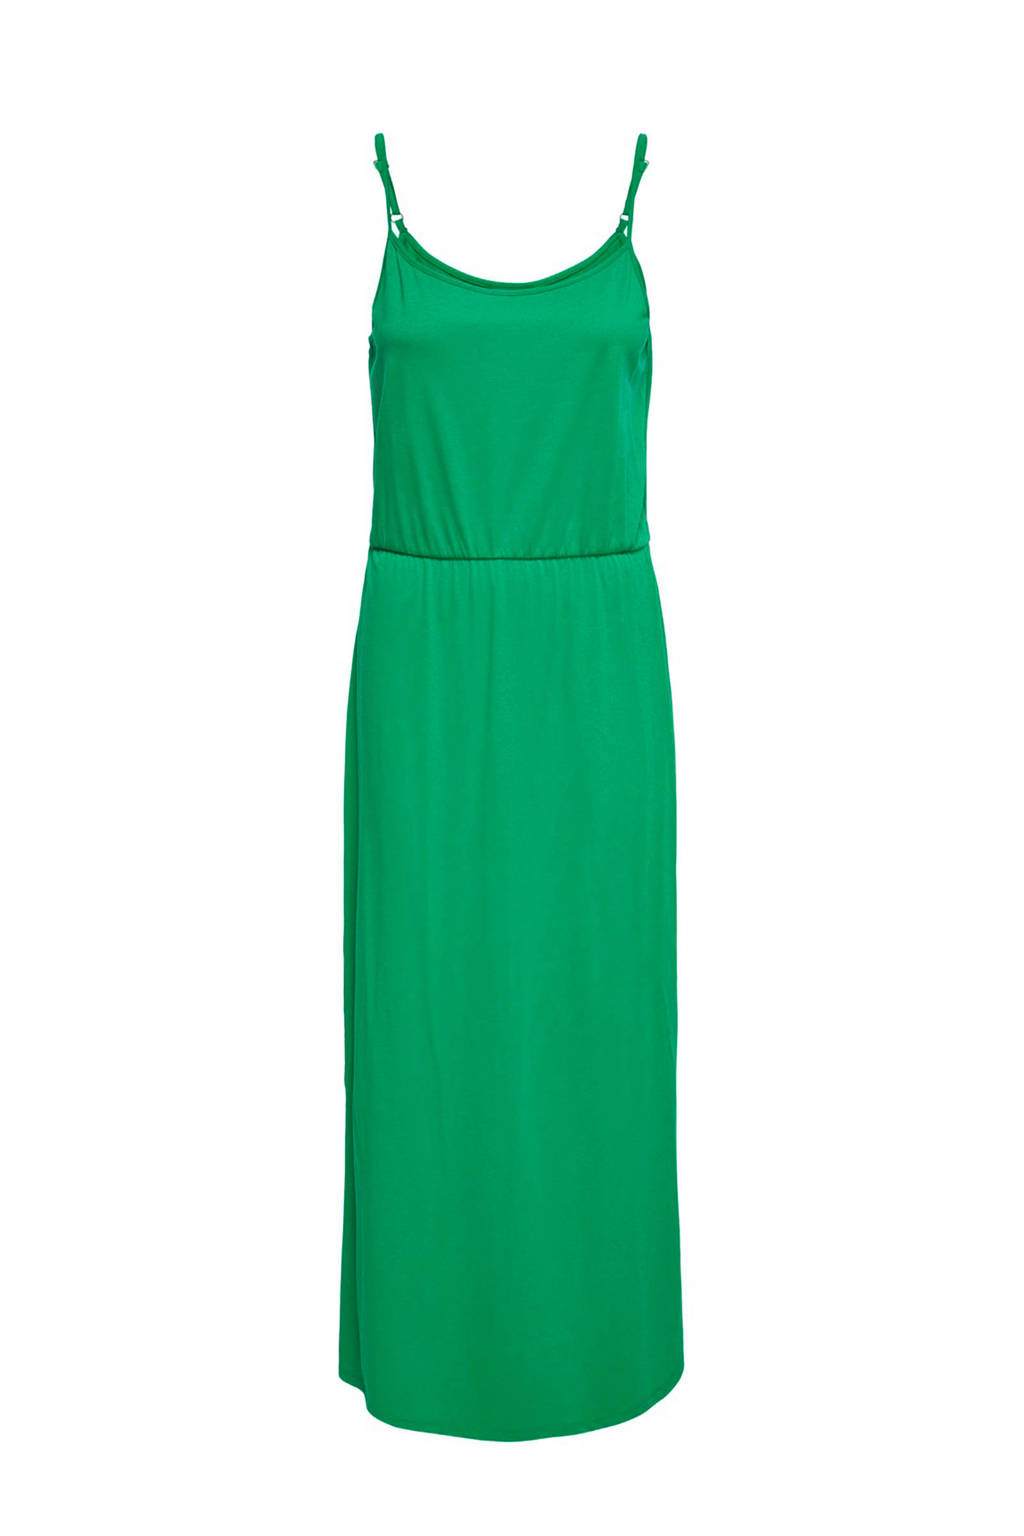 JACQUELINE DE YONG mouwloze maxi jurk groen, Groen